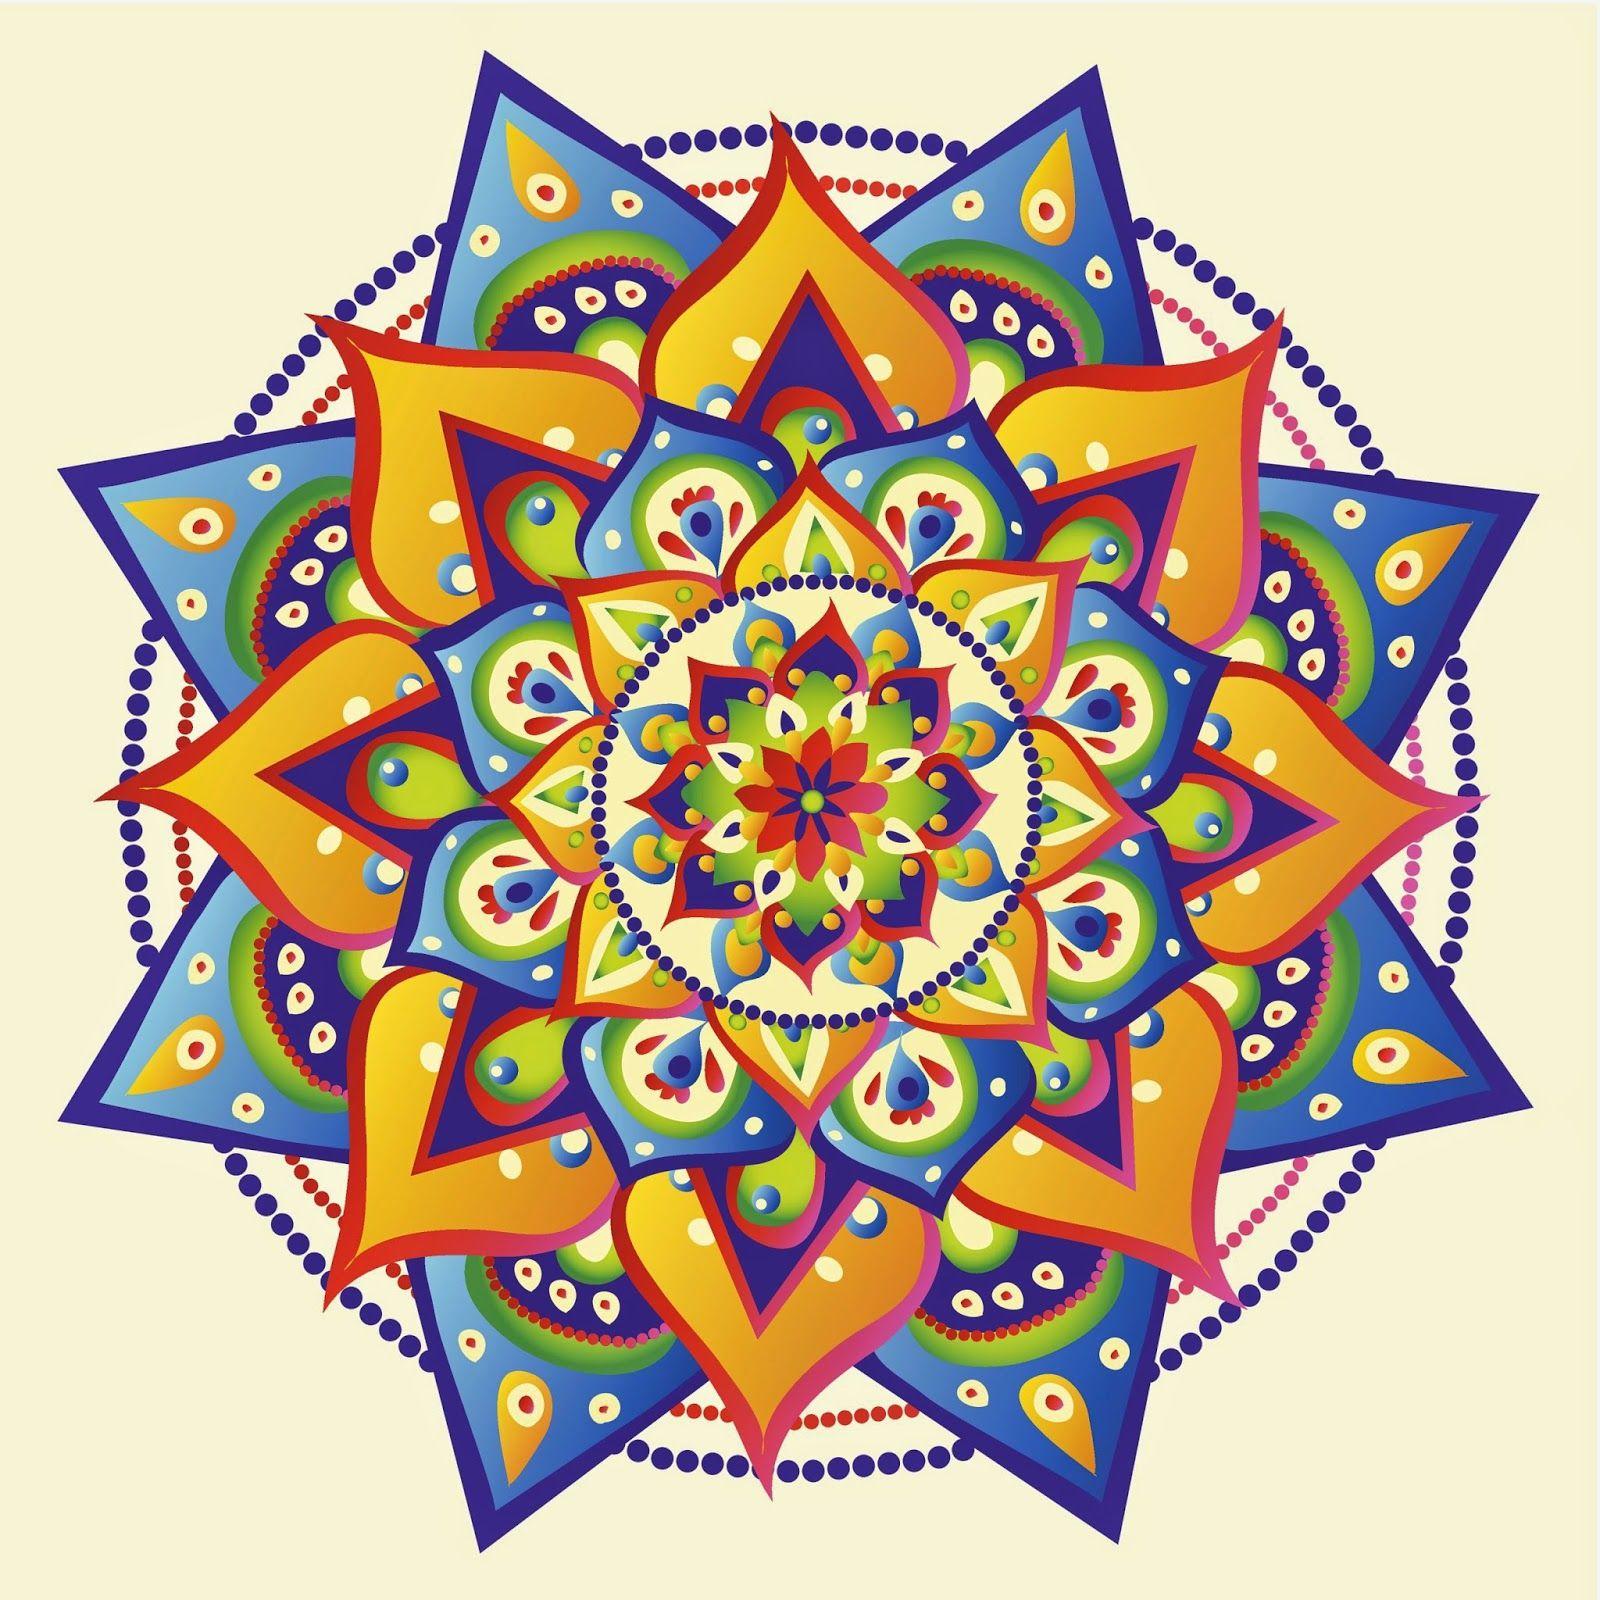 Mandalas De Amor Significado Para Colorear Buscar Con Google